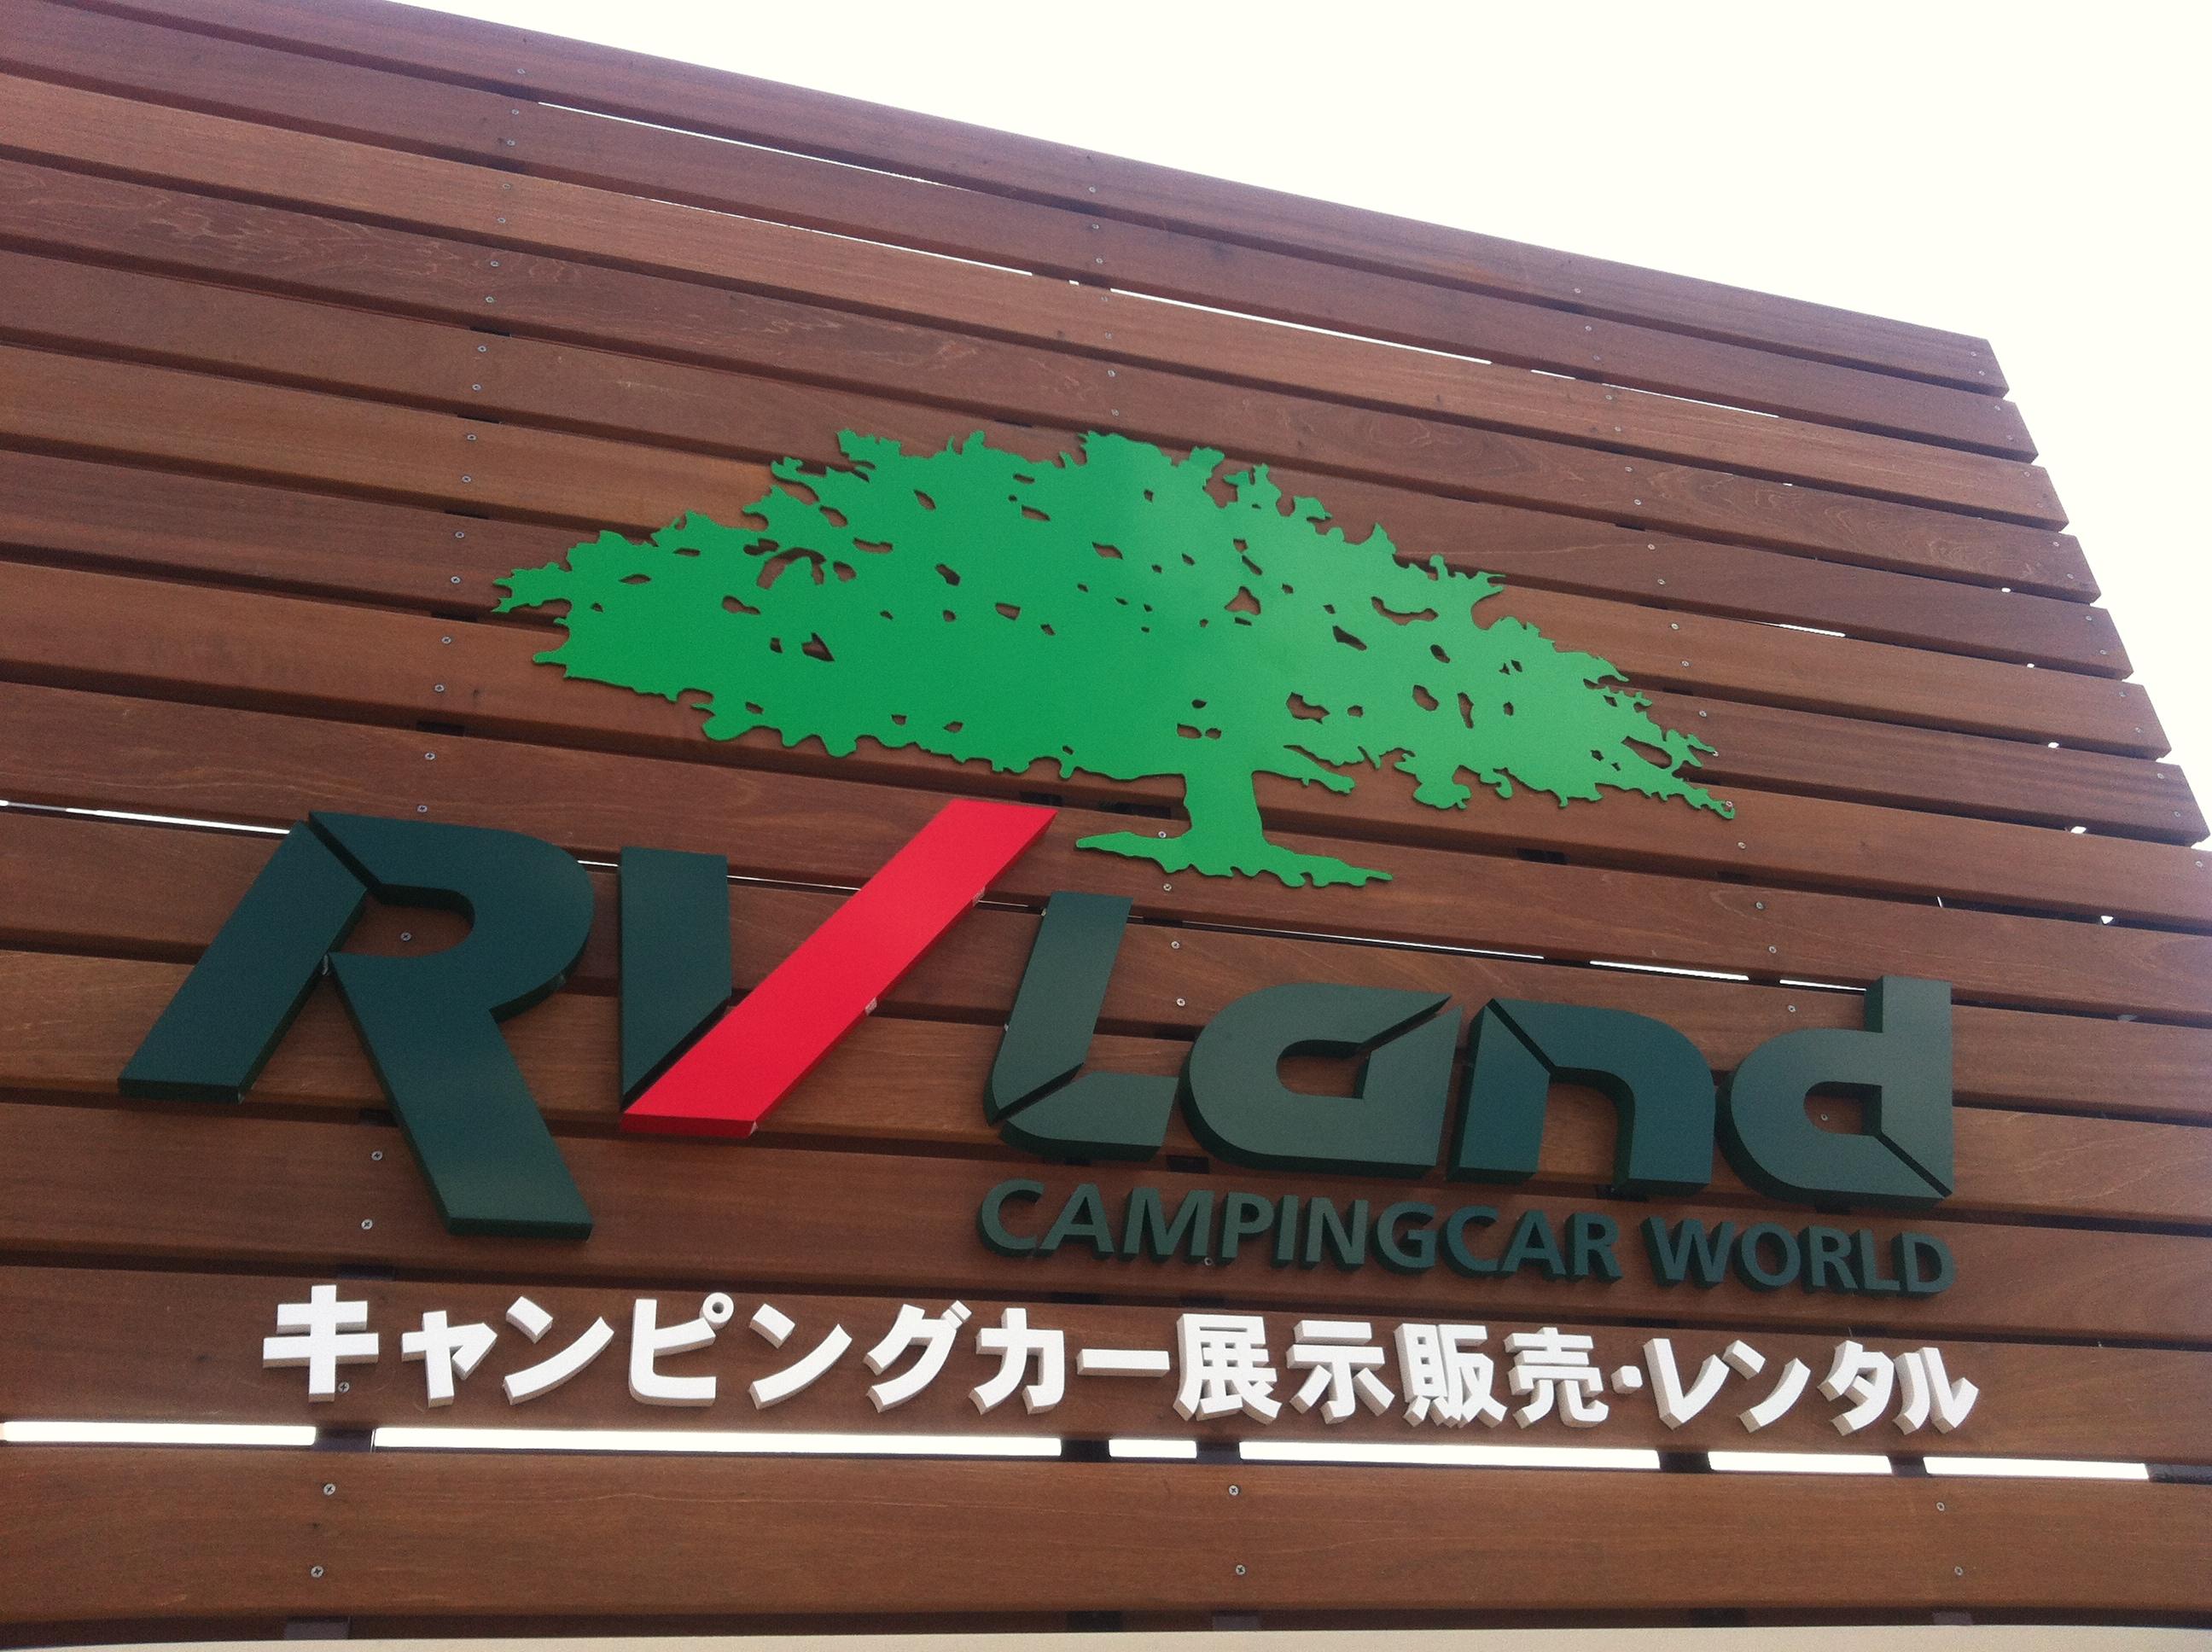 http://www.vantech.jp/shops/info/IMG_5643.JPG